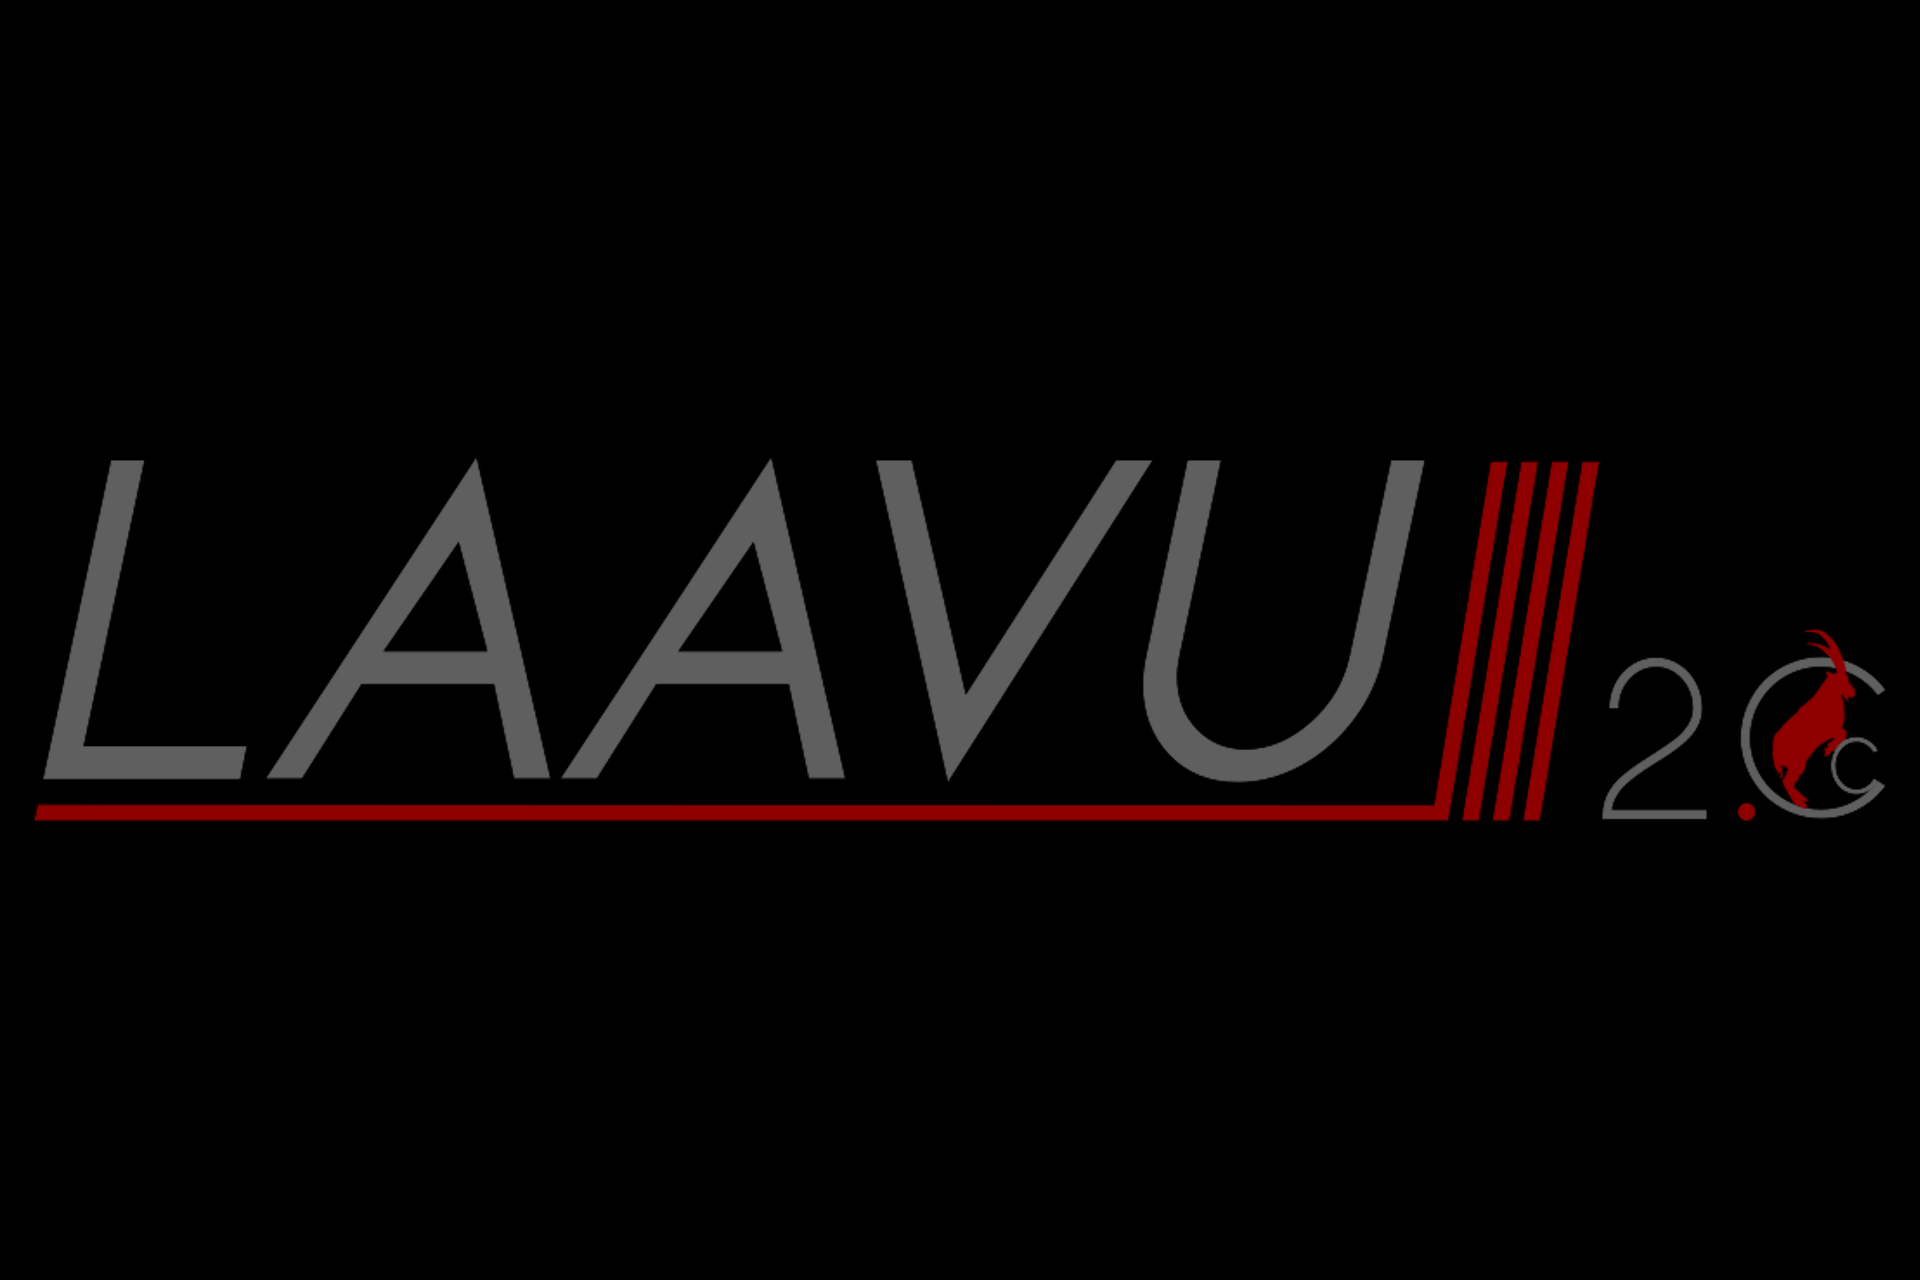 Logo LAAVU 2.0